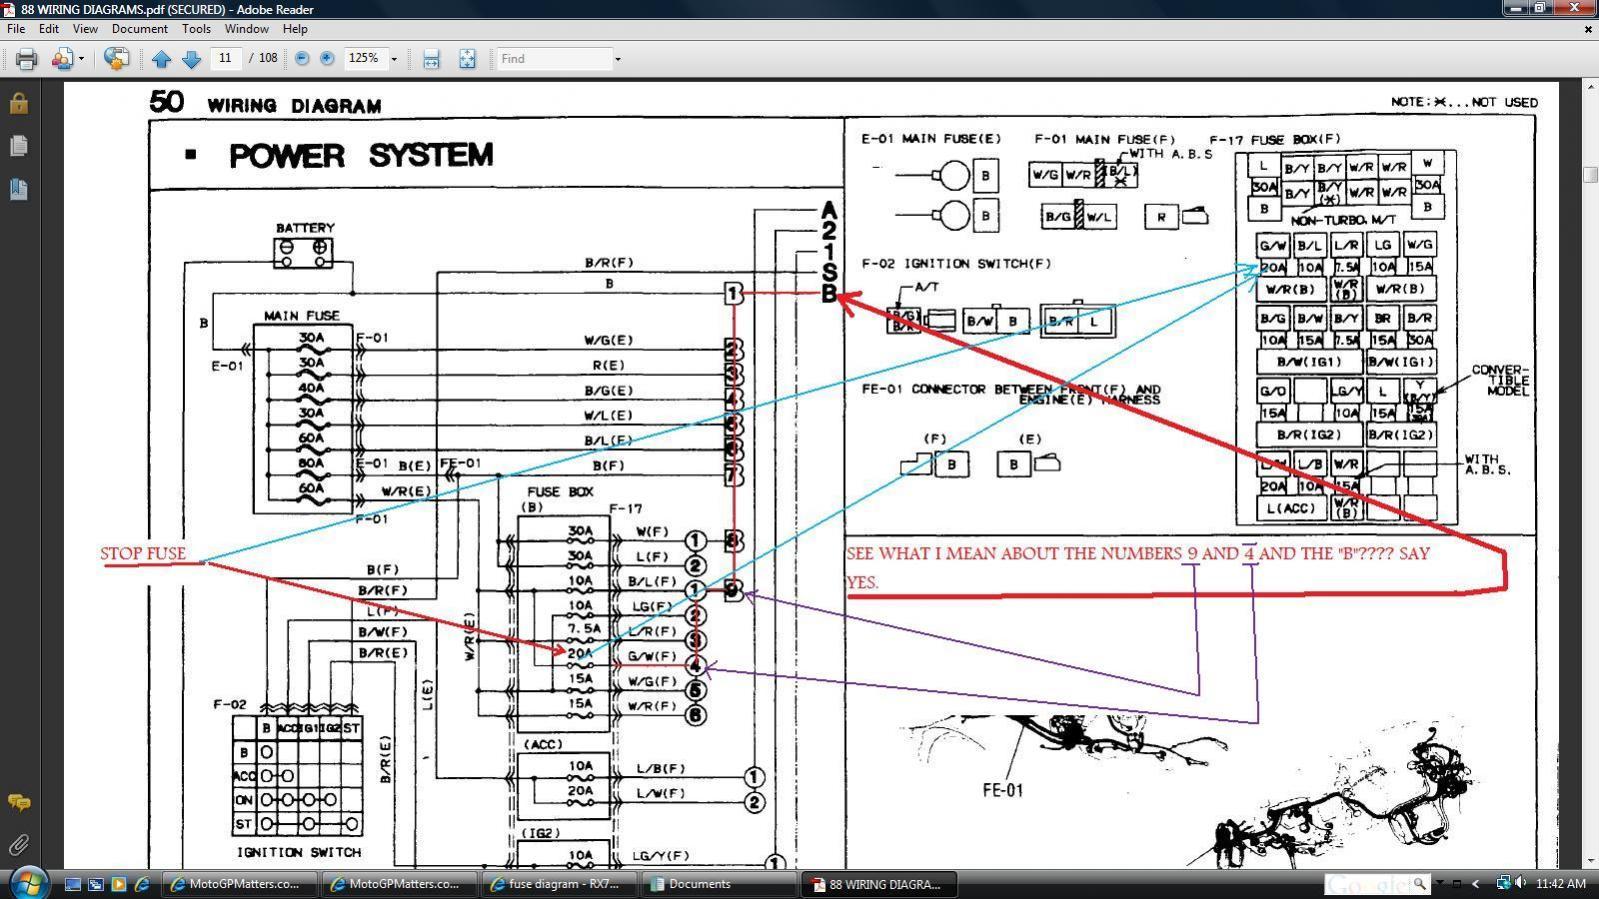 hight resolution of fuse diagram rx7club com mazda rx7 forum 87 rx7 fuse box diagram 93 rx7 fuse box